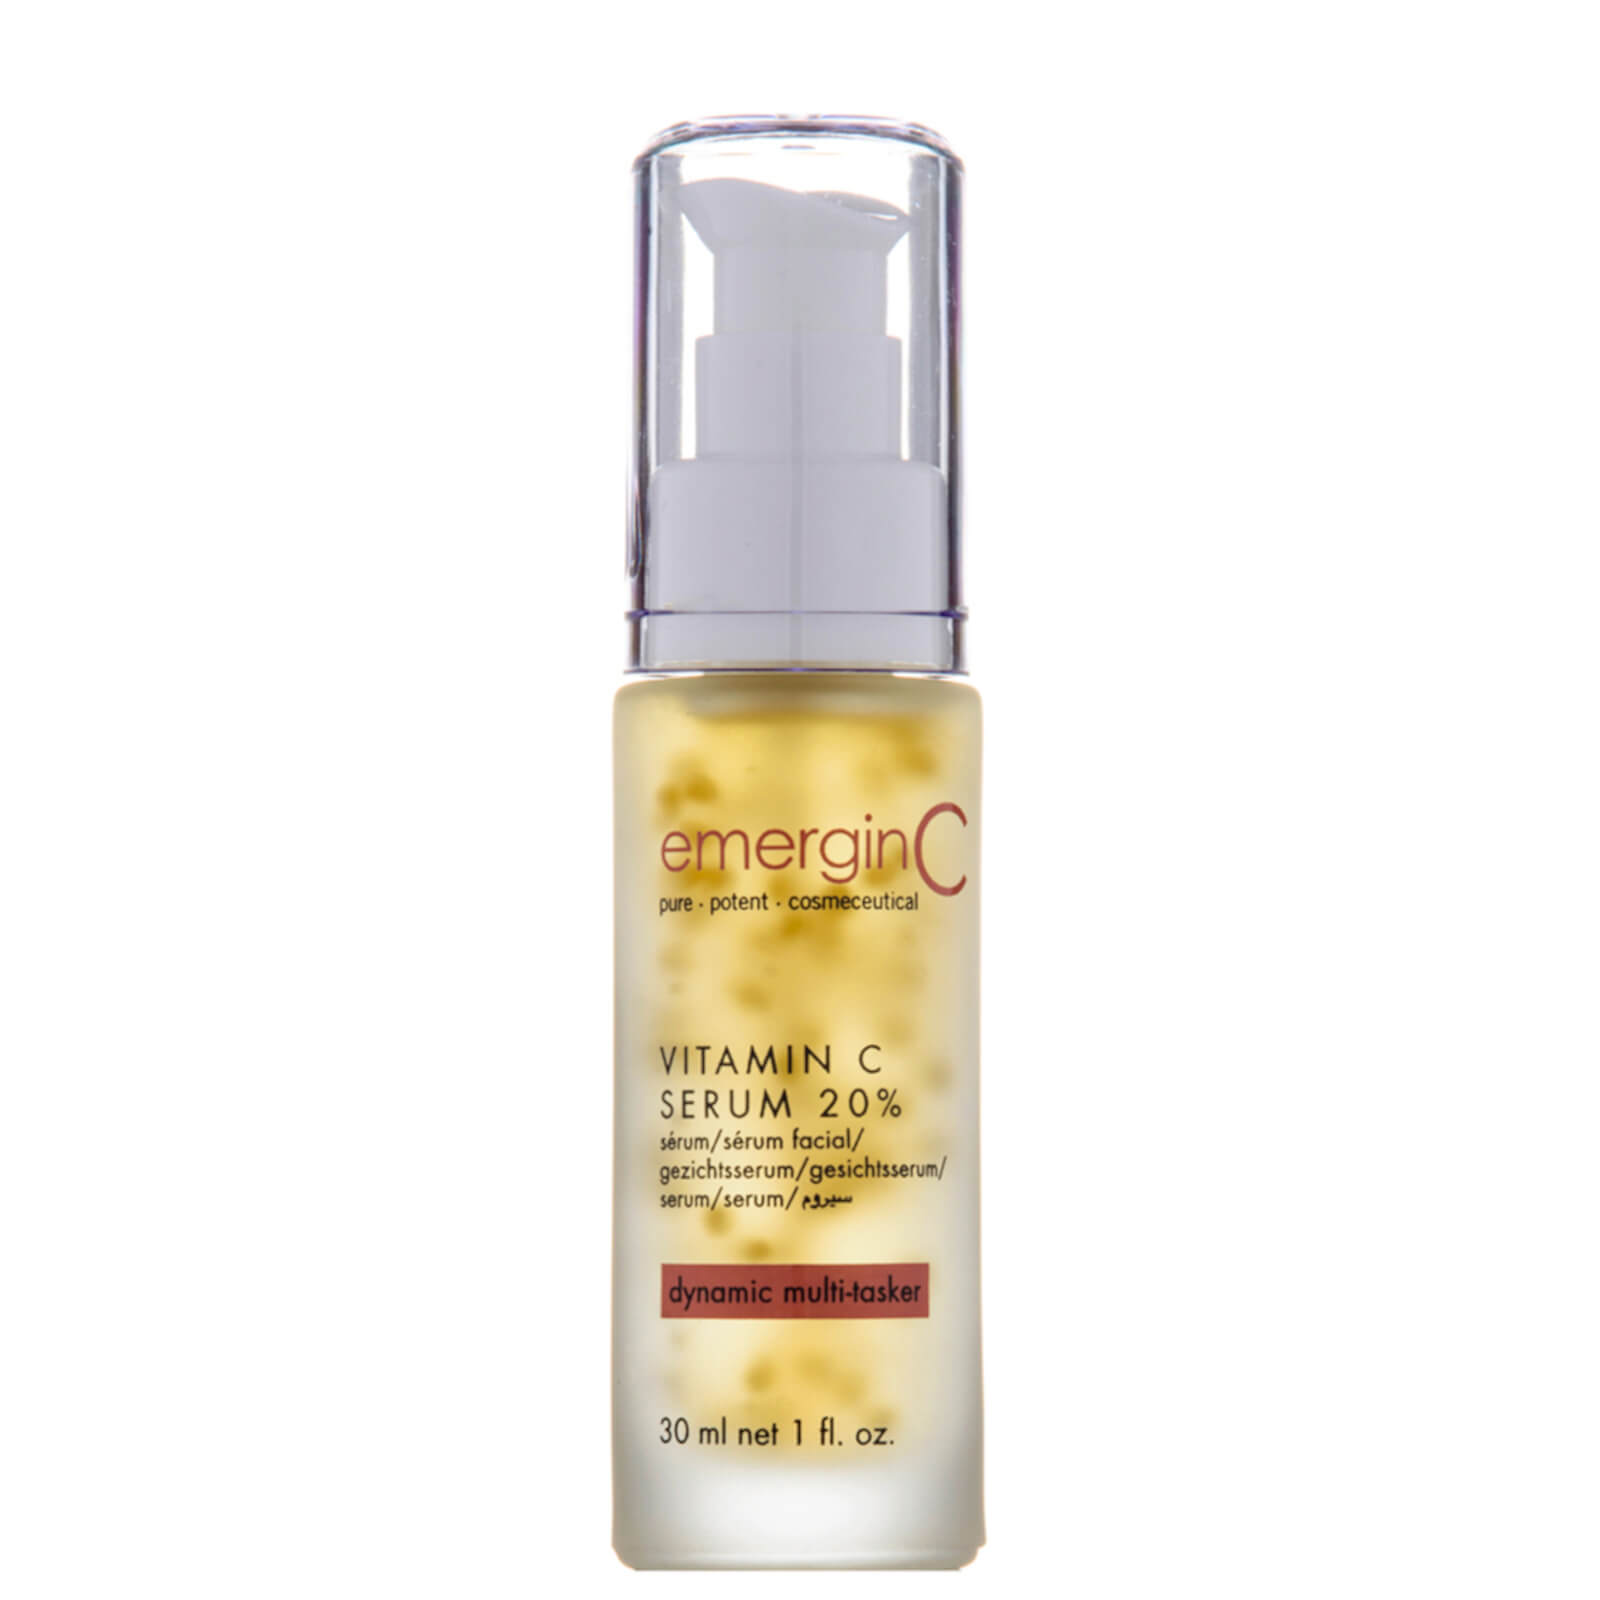 emerginc vitamin c serum 20% 30ml